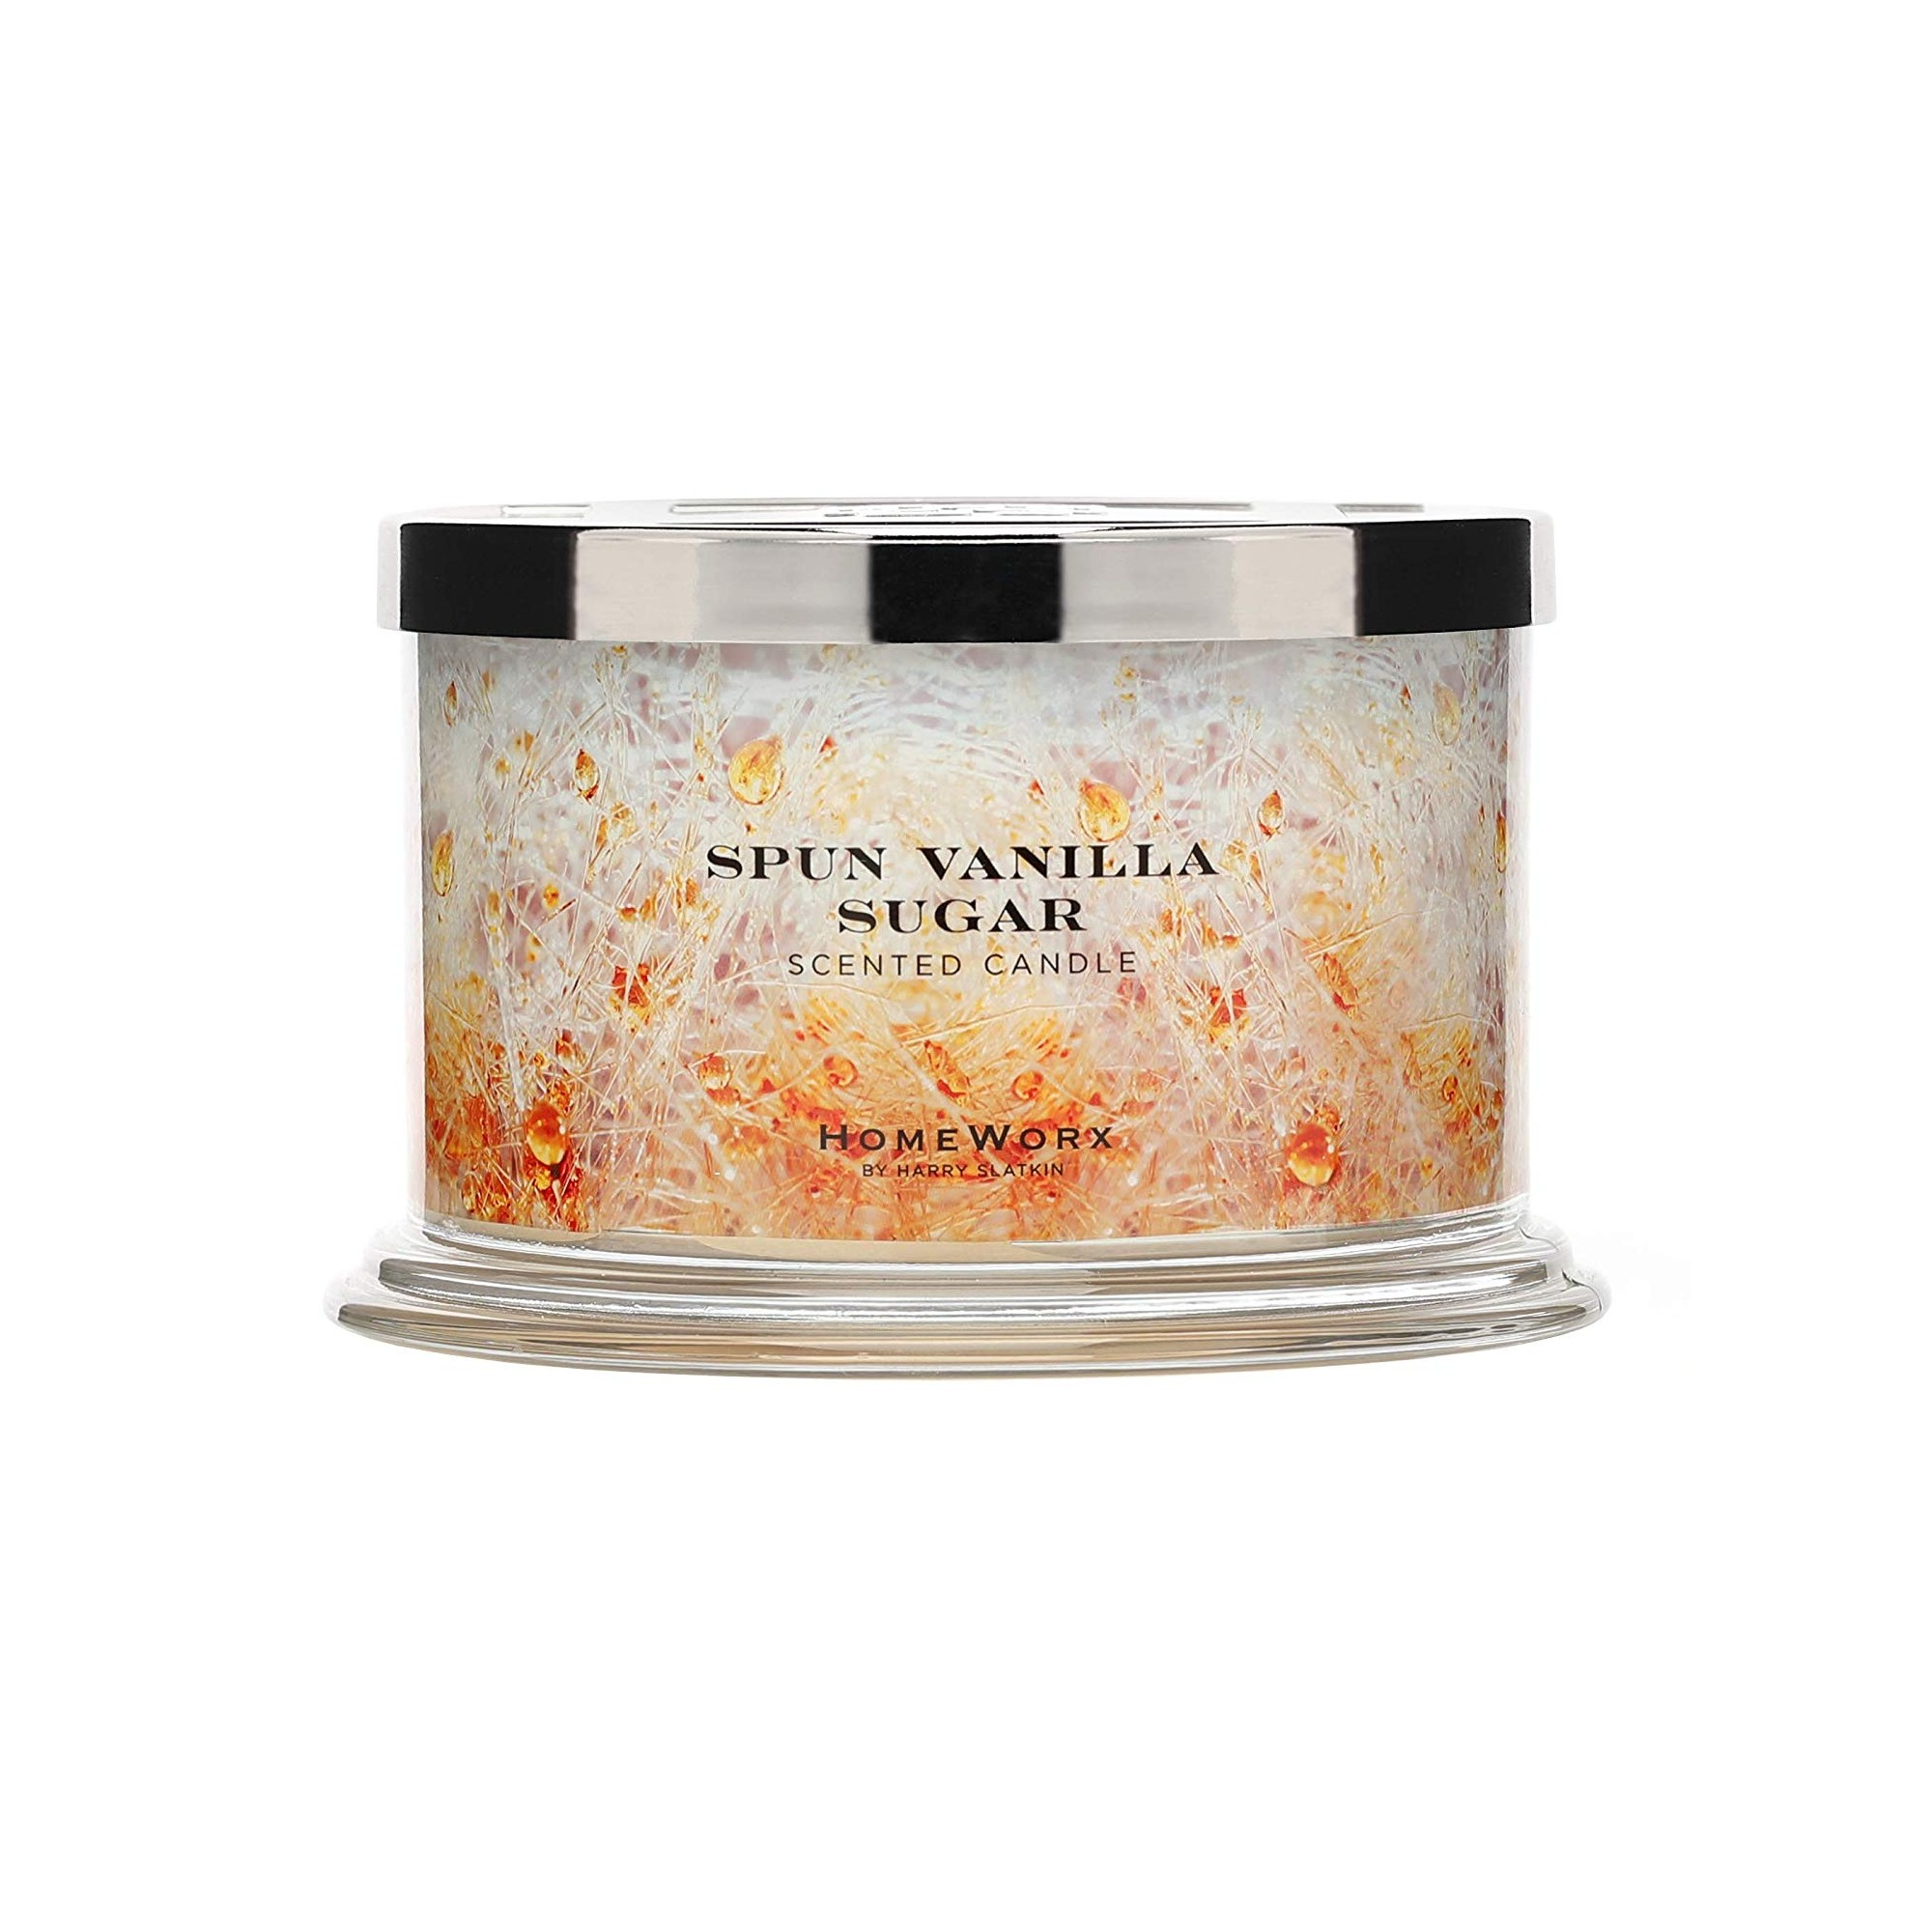 Homeworx by Harry Slatkin Spun Vanilla Sugar 4 Wick Candle